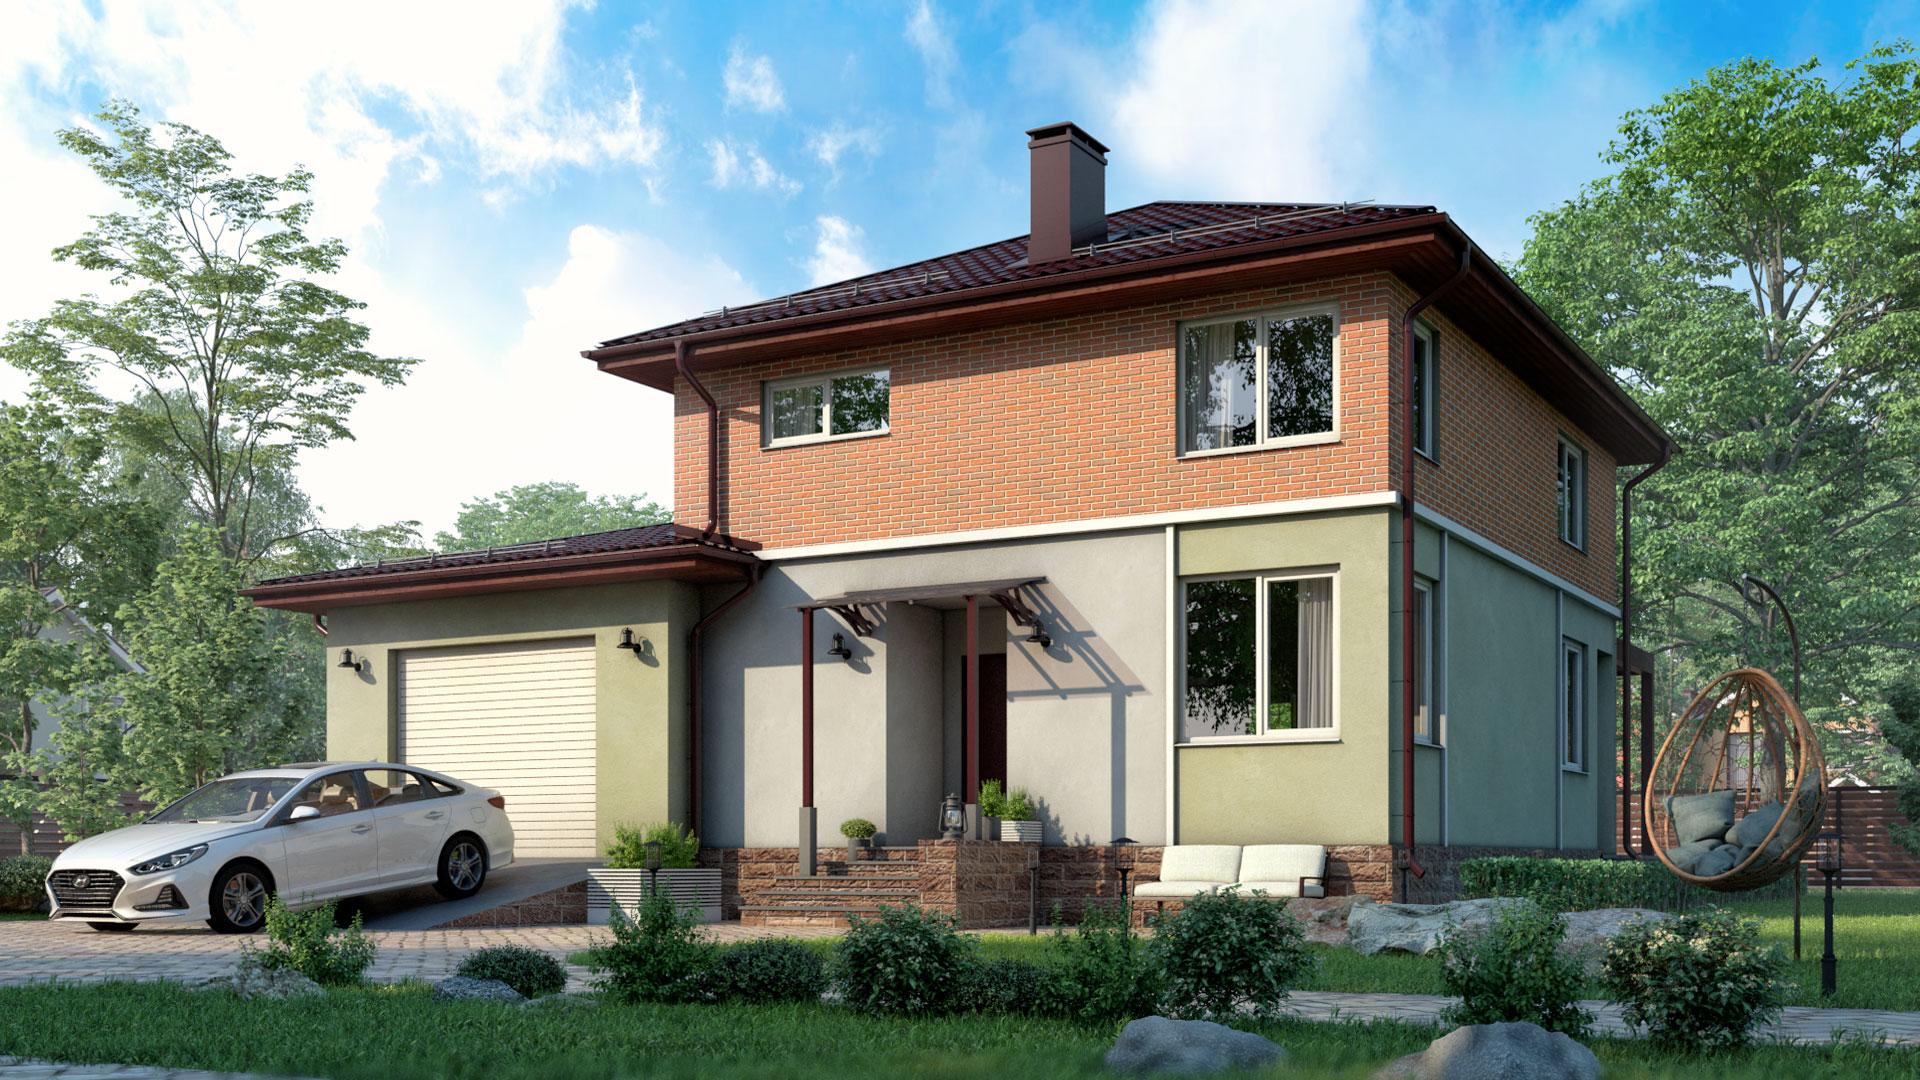 Передний фасад дома 10 на 12 метров двухэтажного площадью 164,60 м2. Проект БП-185.